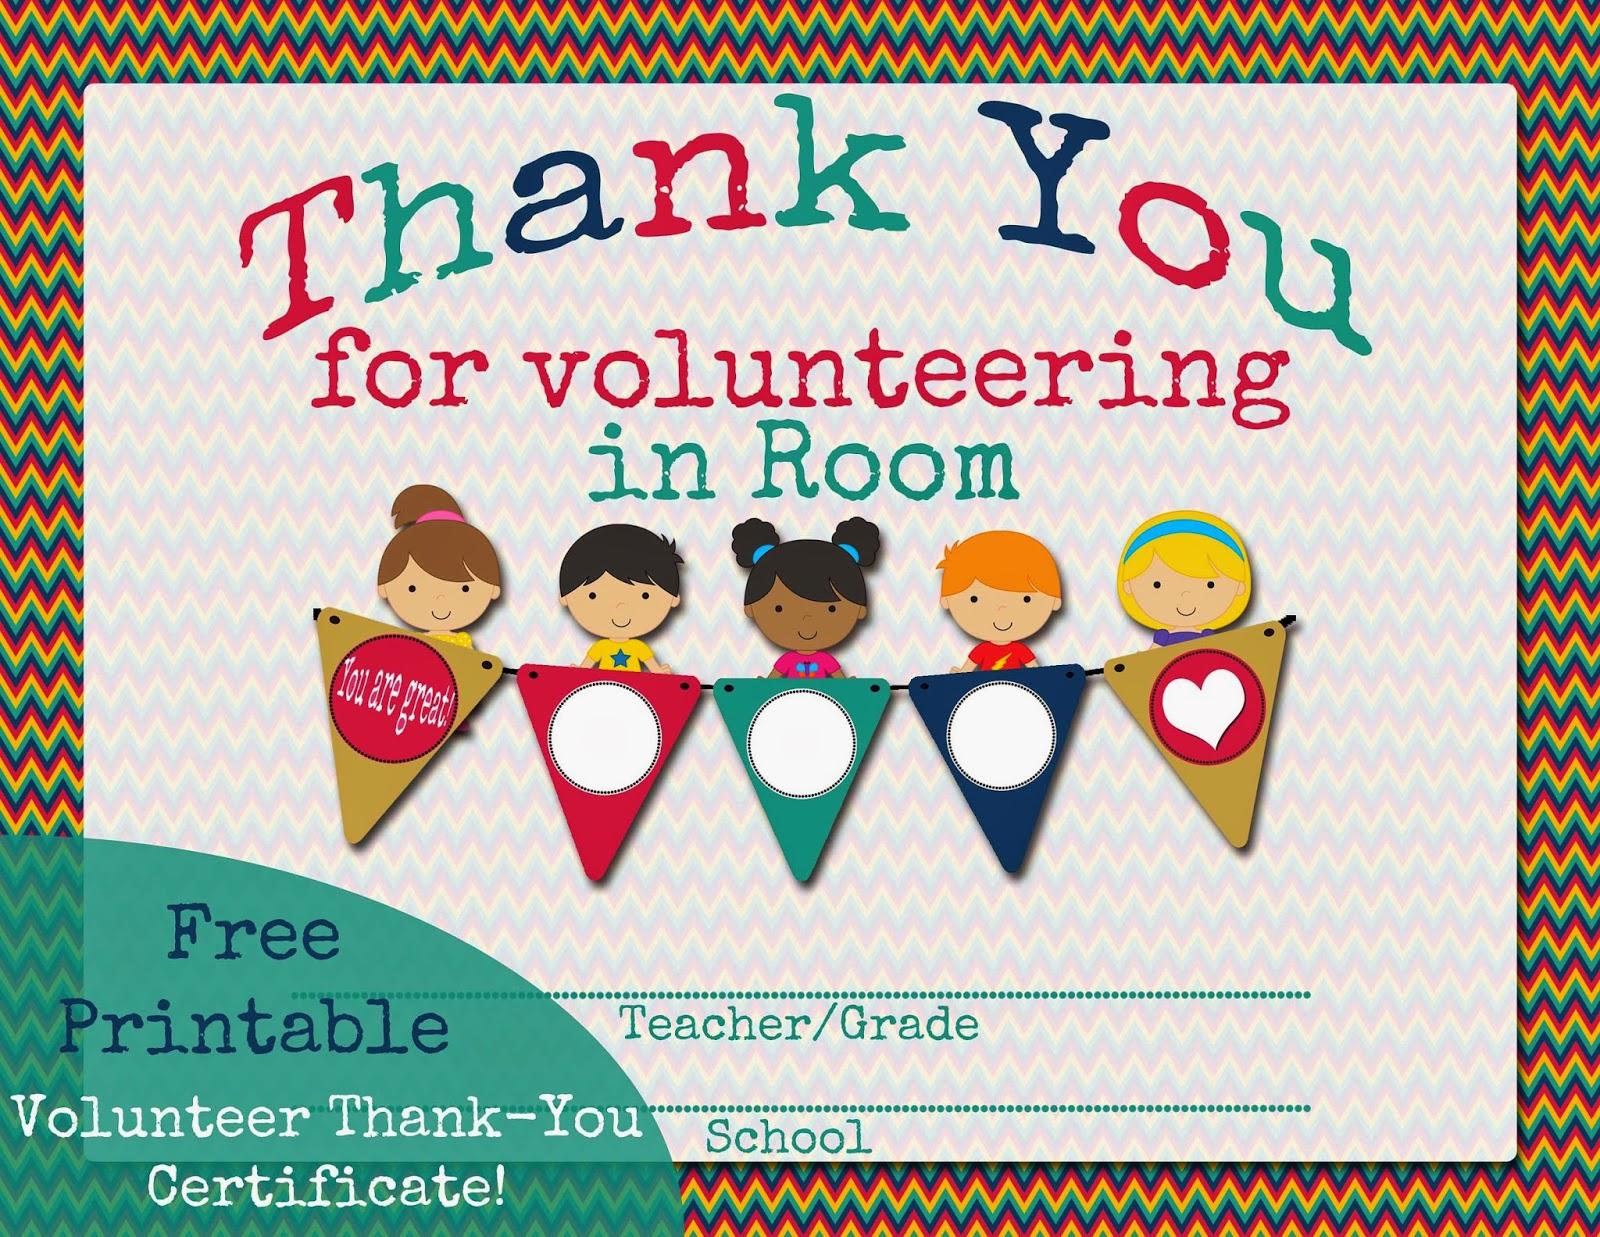 Parent volunteer certificate templates etamemibawa parent volunteer certificate templates yadclub Image collections